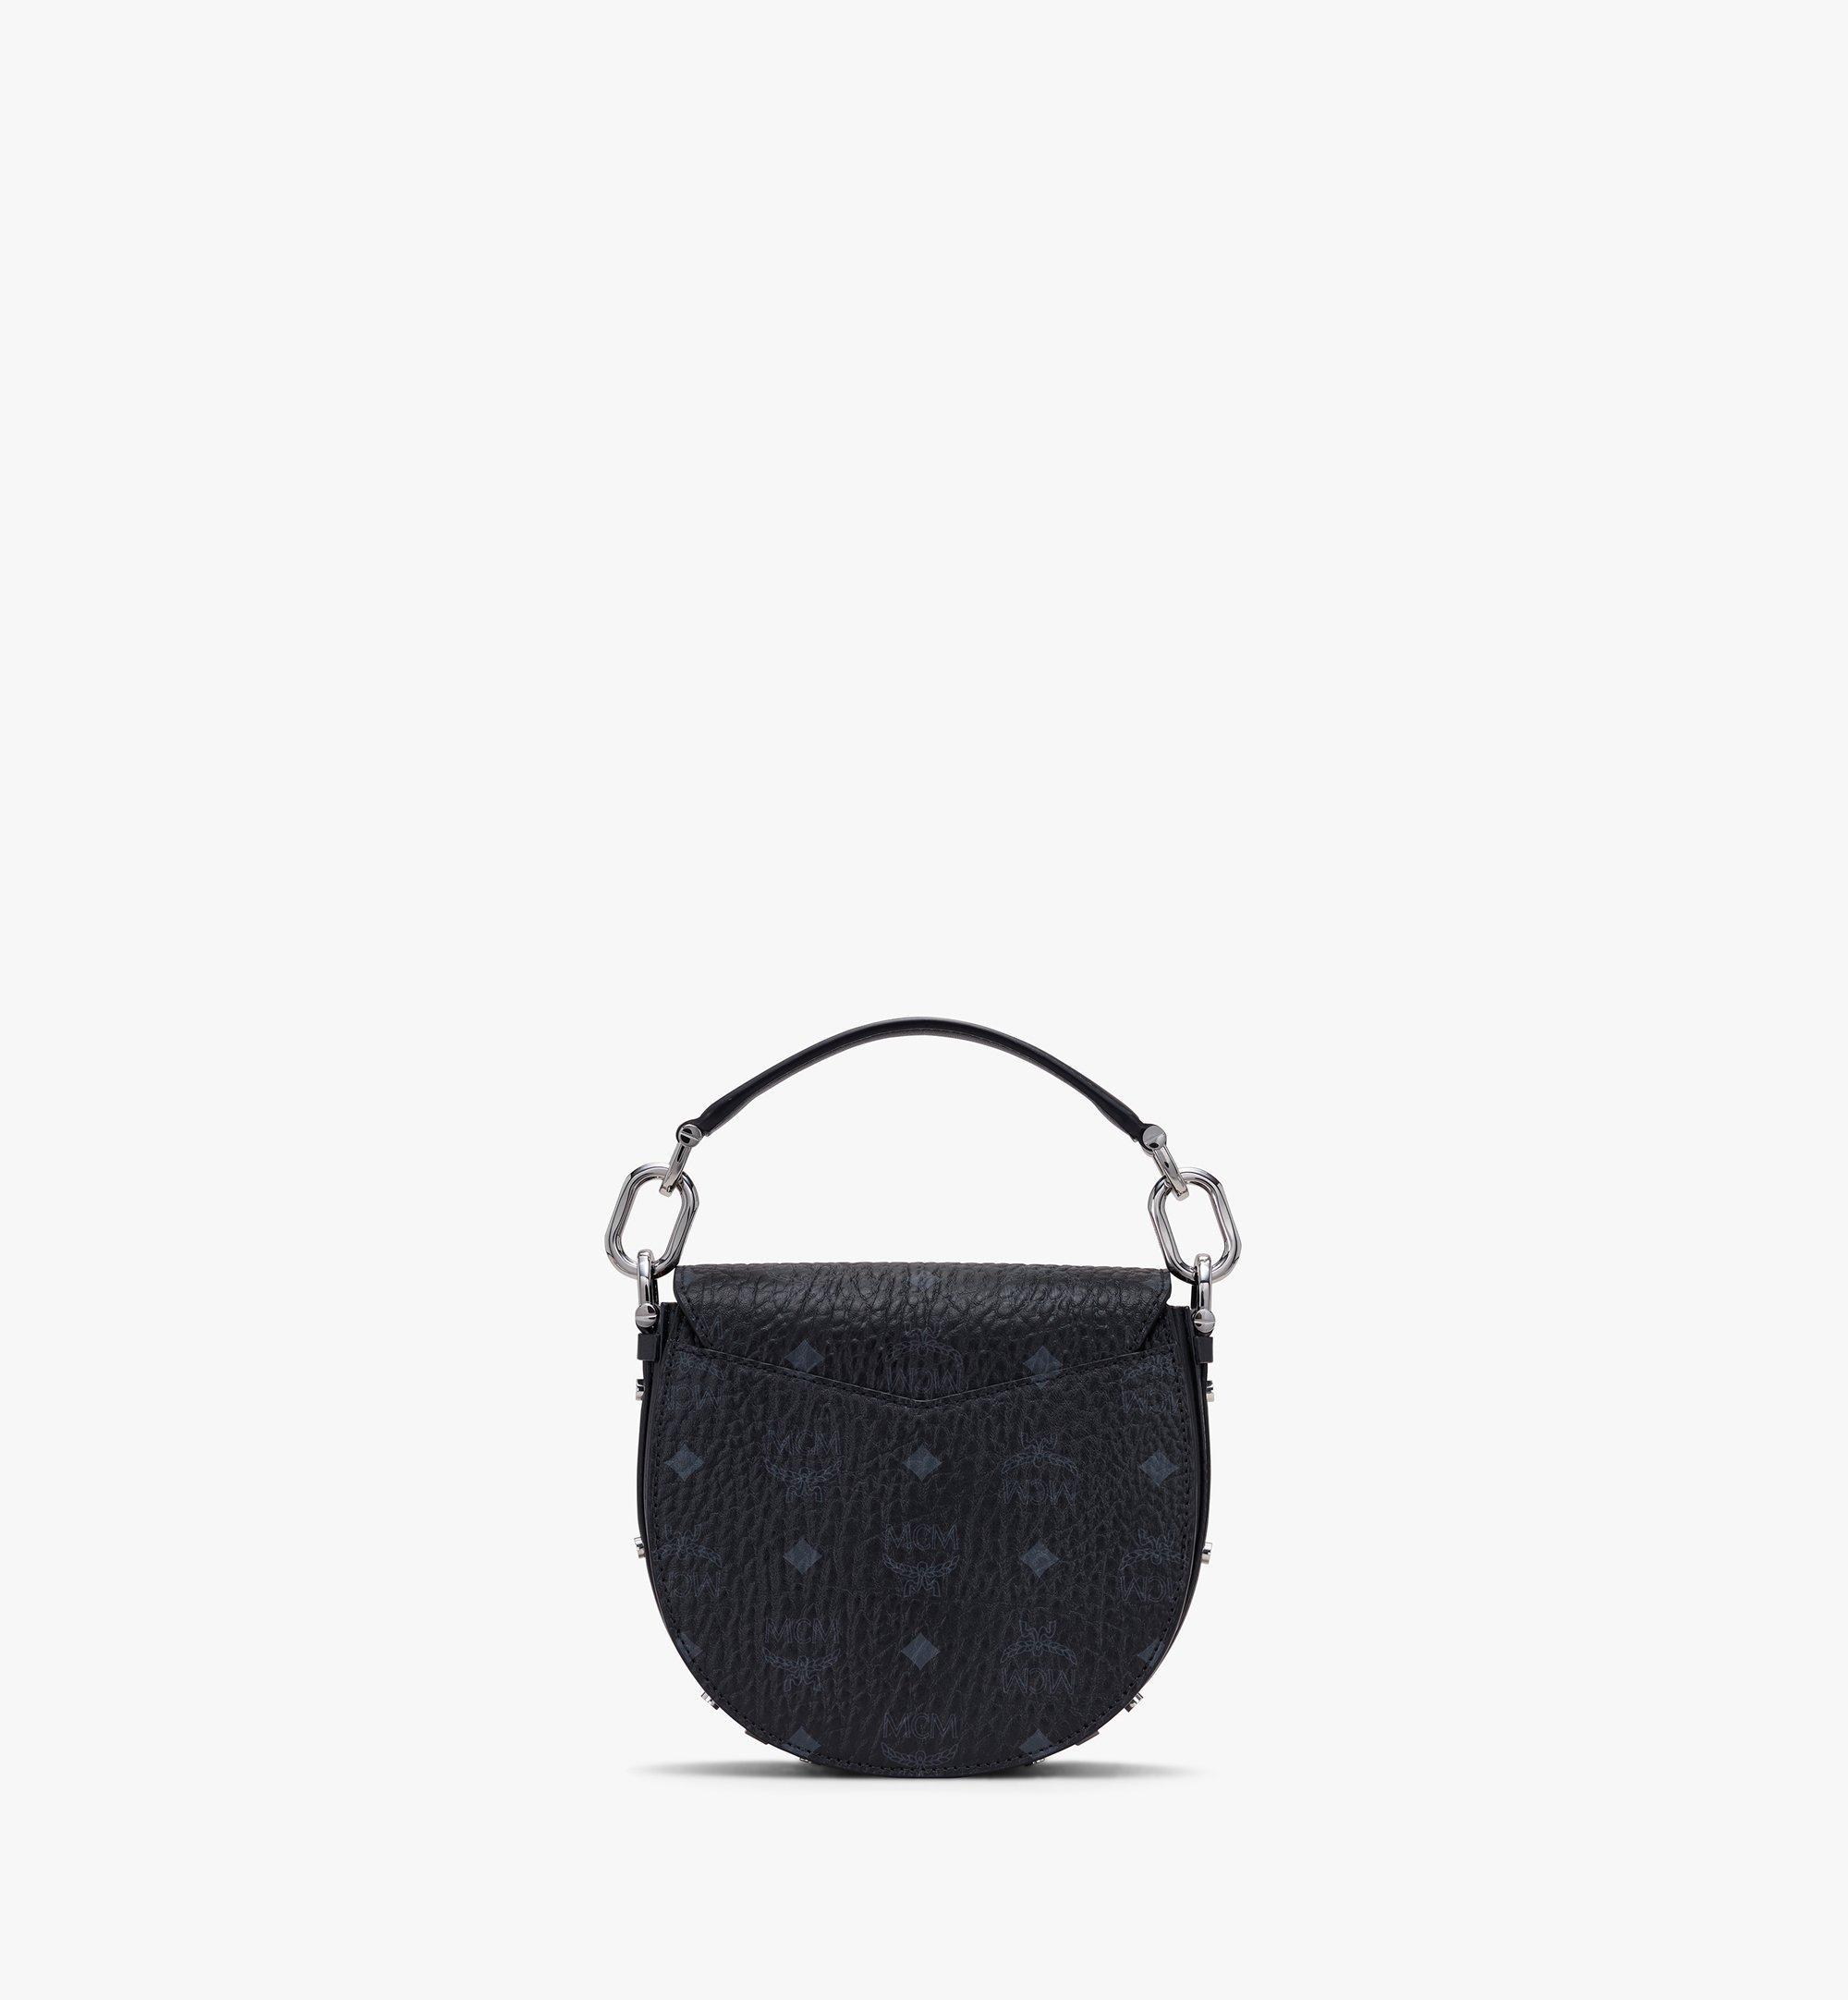 MCM Patricia Shoulder Bag in Visetos Black MWSASPA08BK001 Alternate View 3